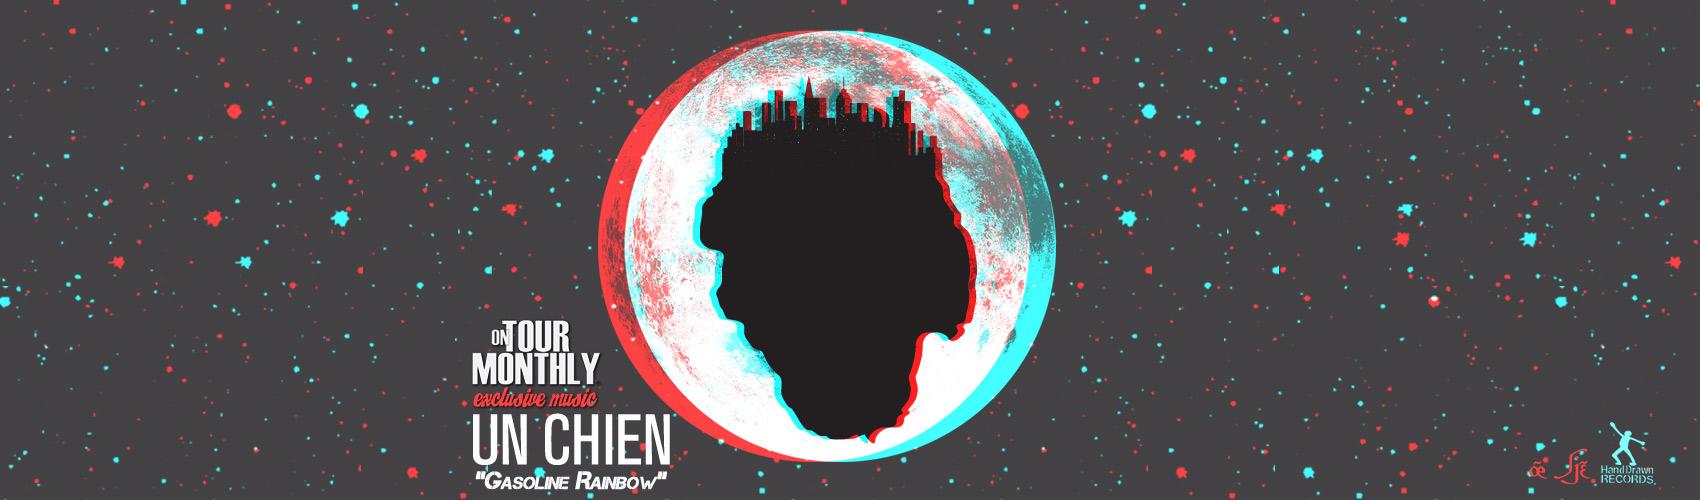 Exclusive Music: Un Chien